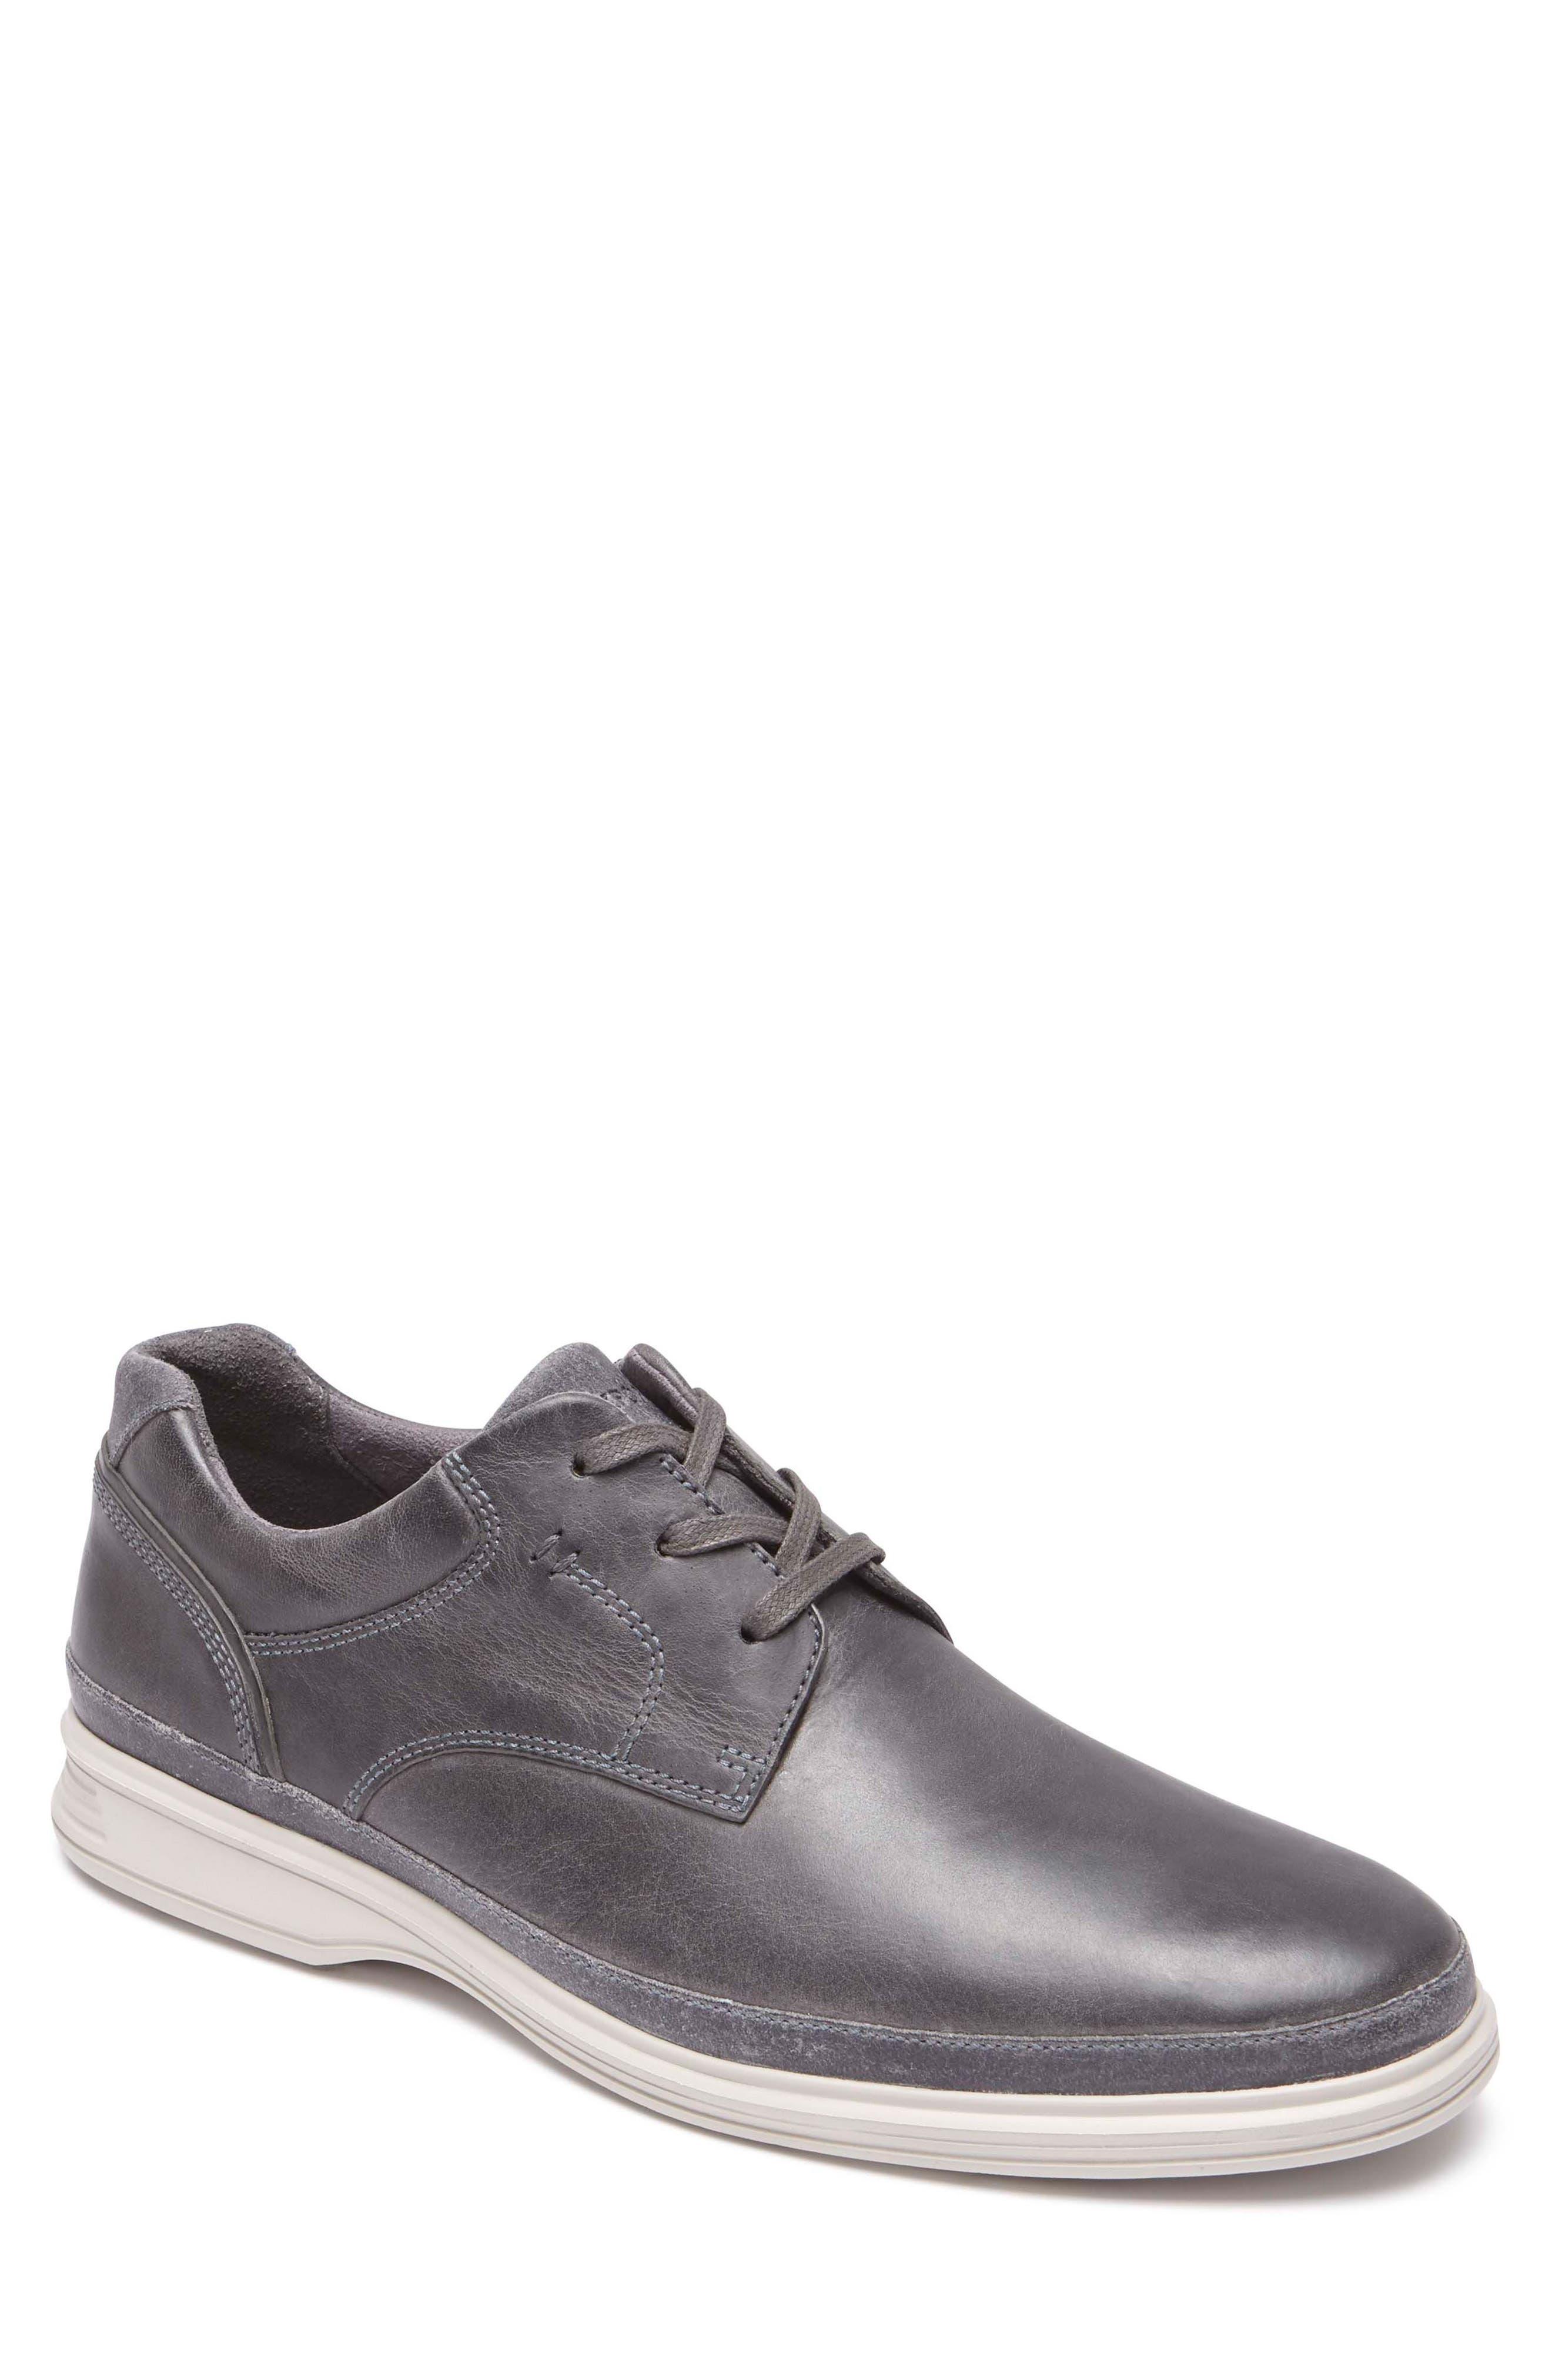 Dressports 2 Go Plain Toe Derby,                         Main,                         color, Grey Leather